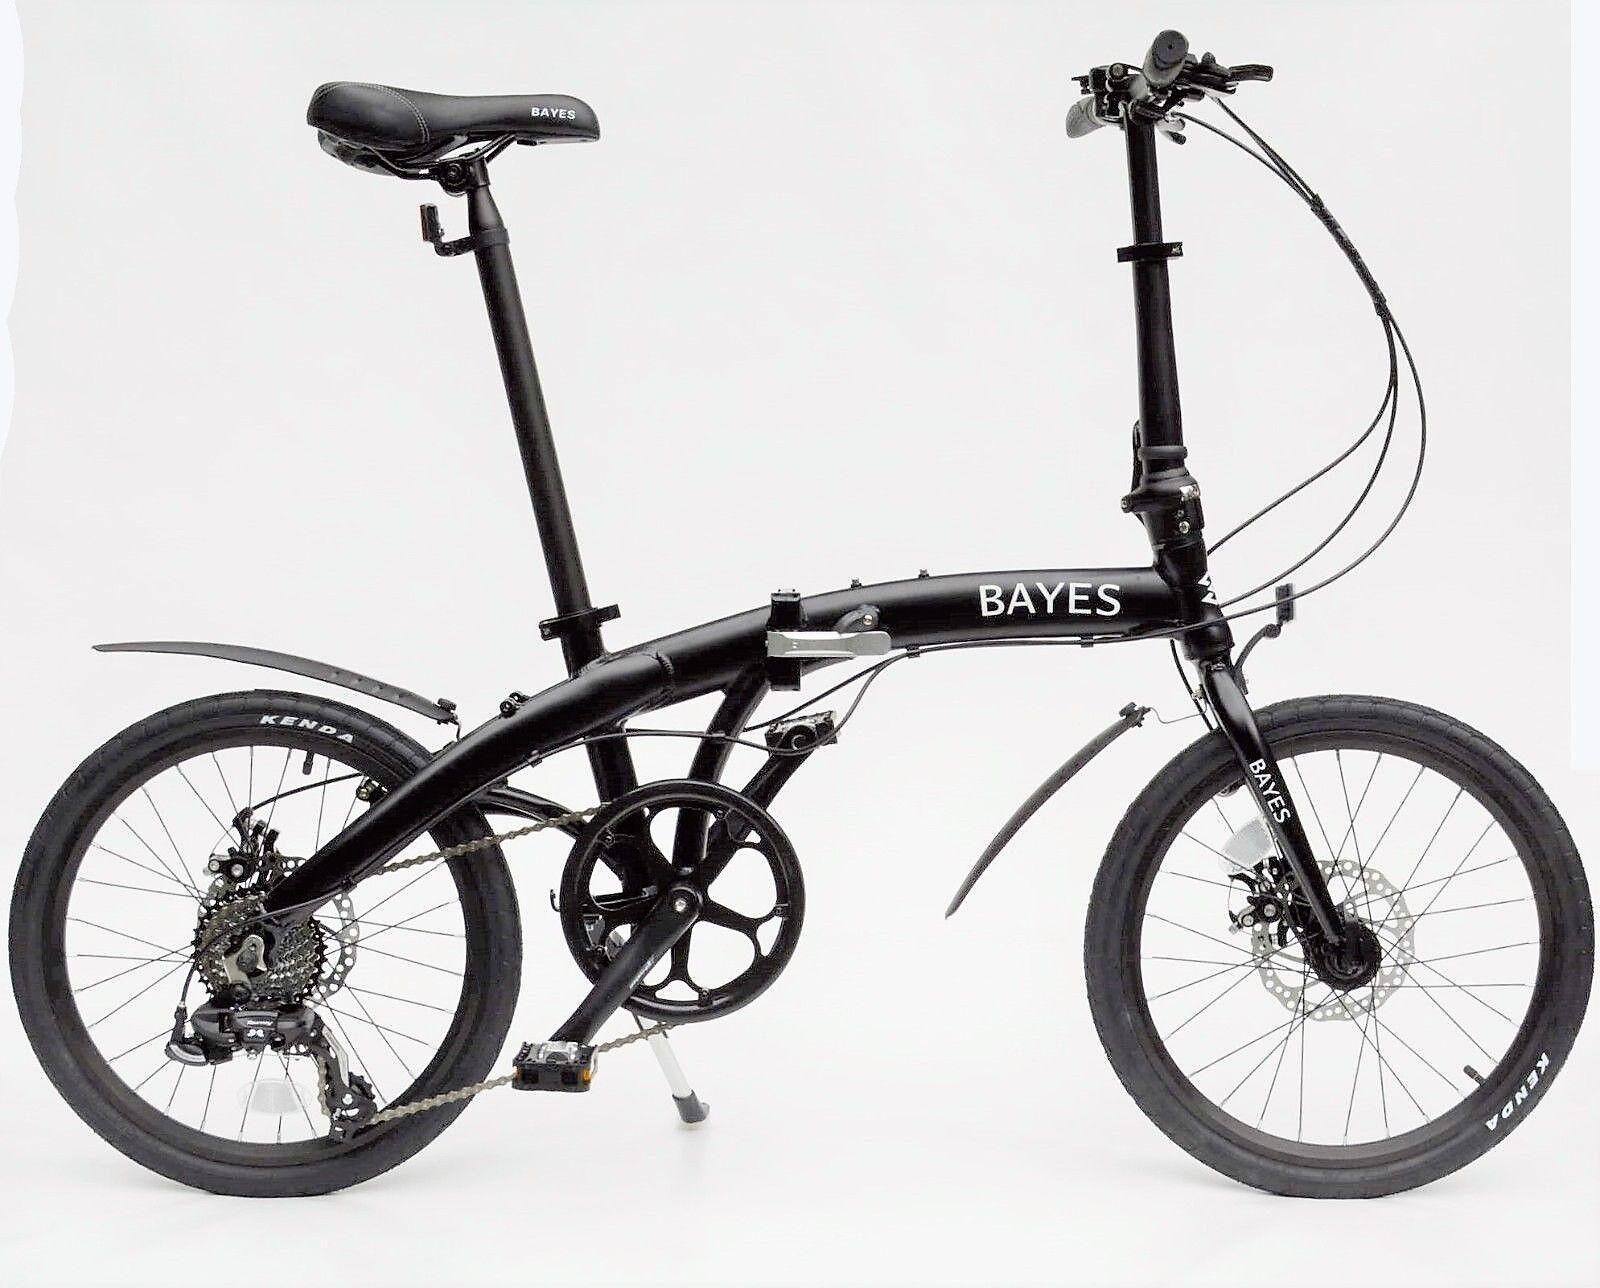 BAYES Faltrad 20   +Transporttasche +Beleuchtung  Scheibenbremsen 8 Gang Shimano